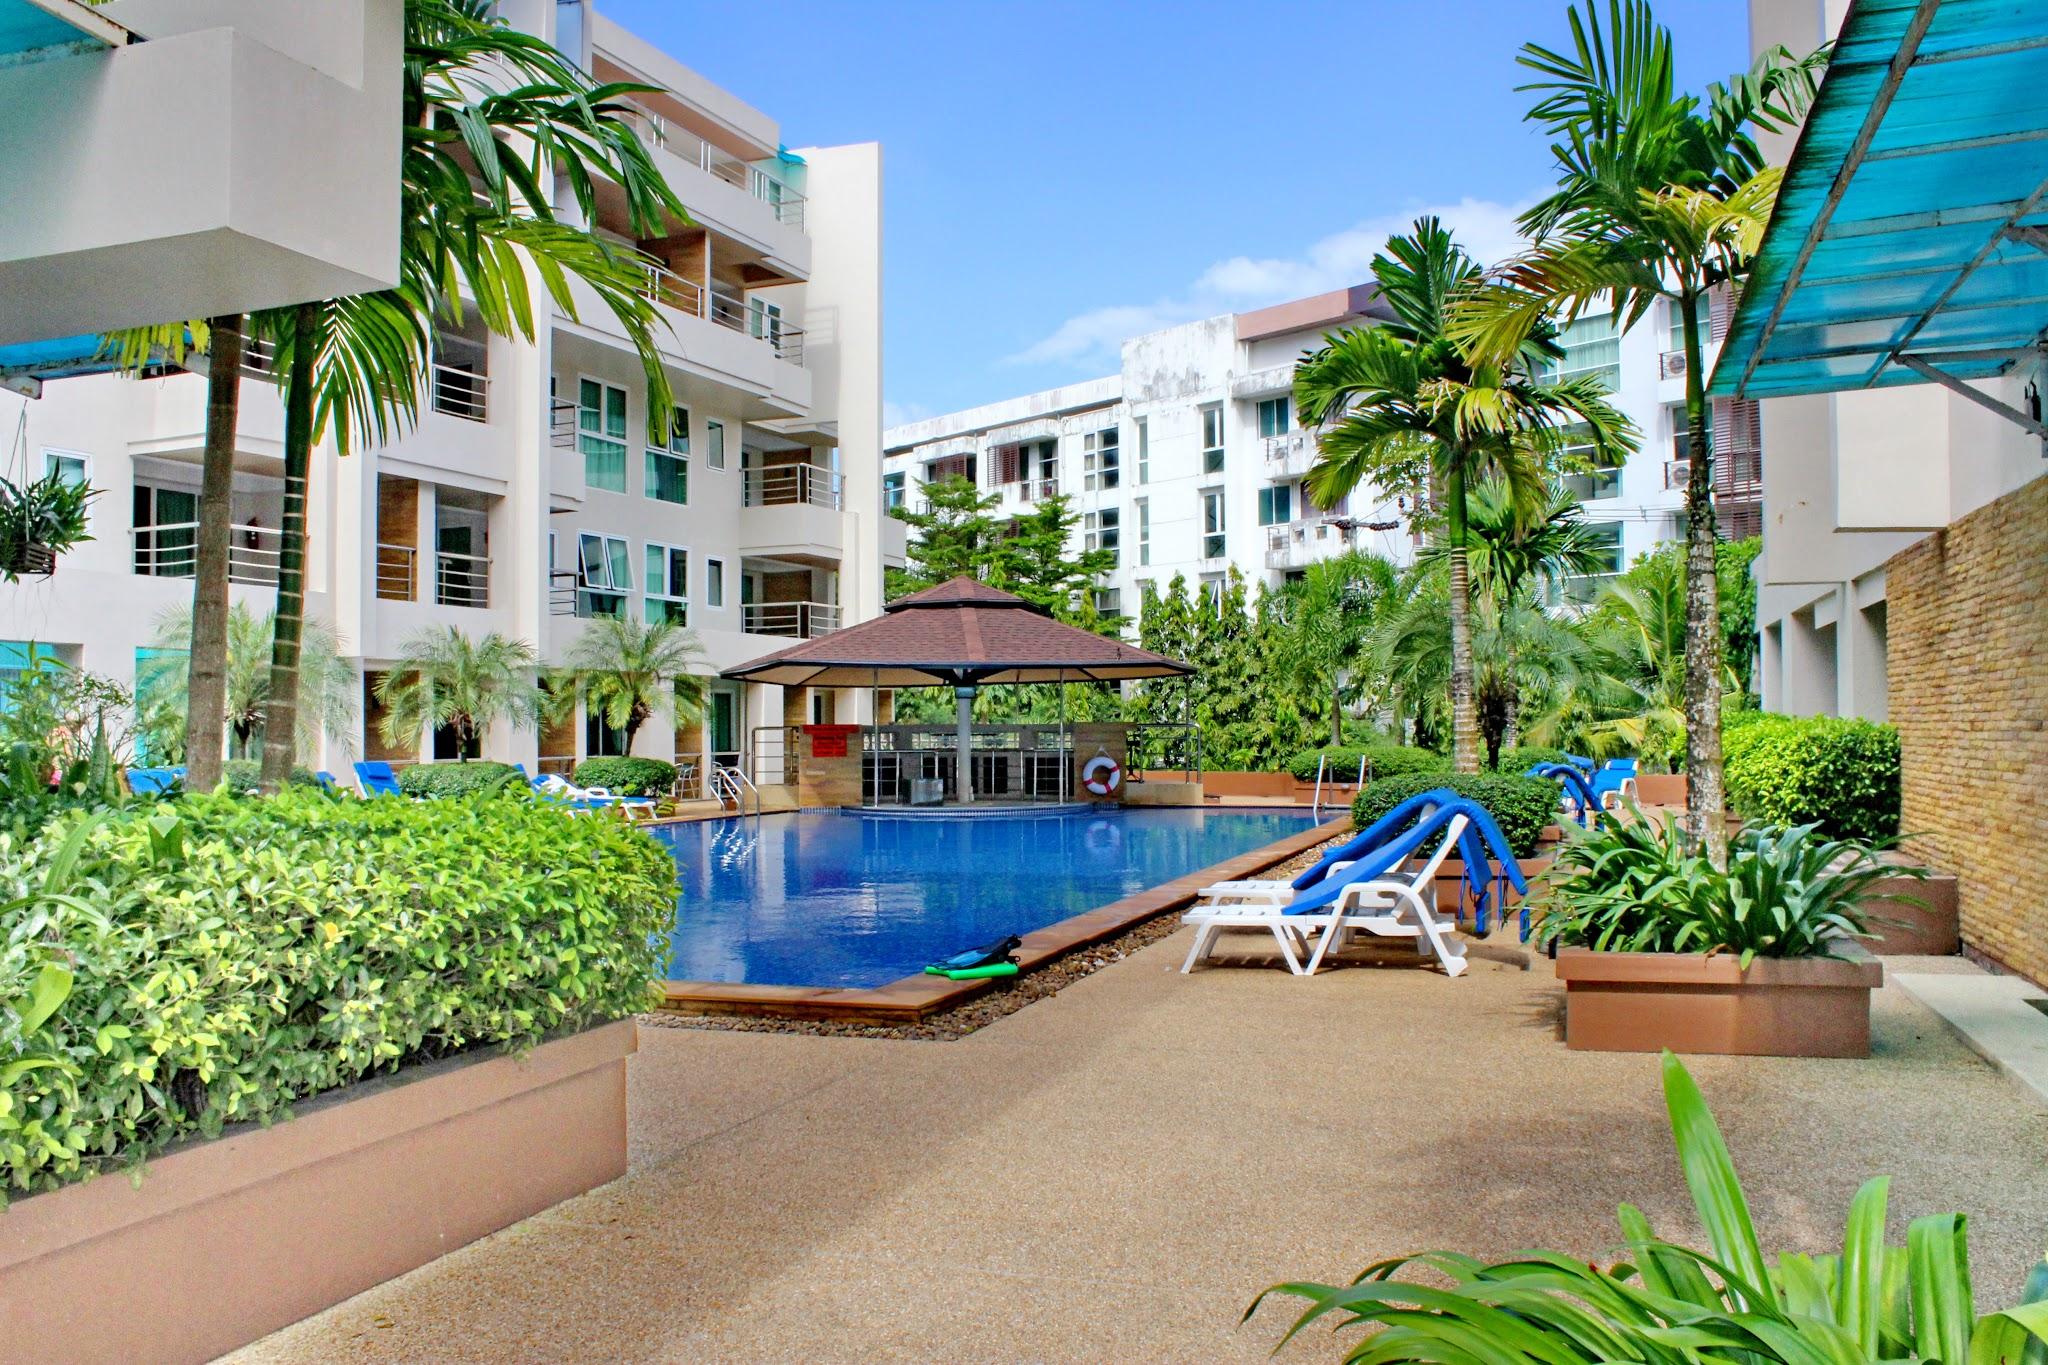 Patong Harbor View Pool and Pool Bar